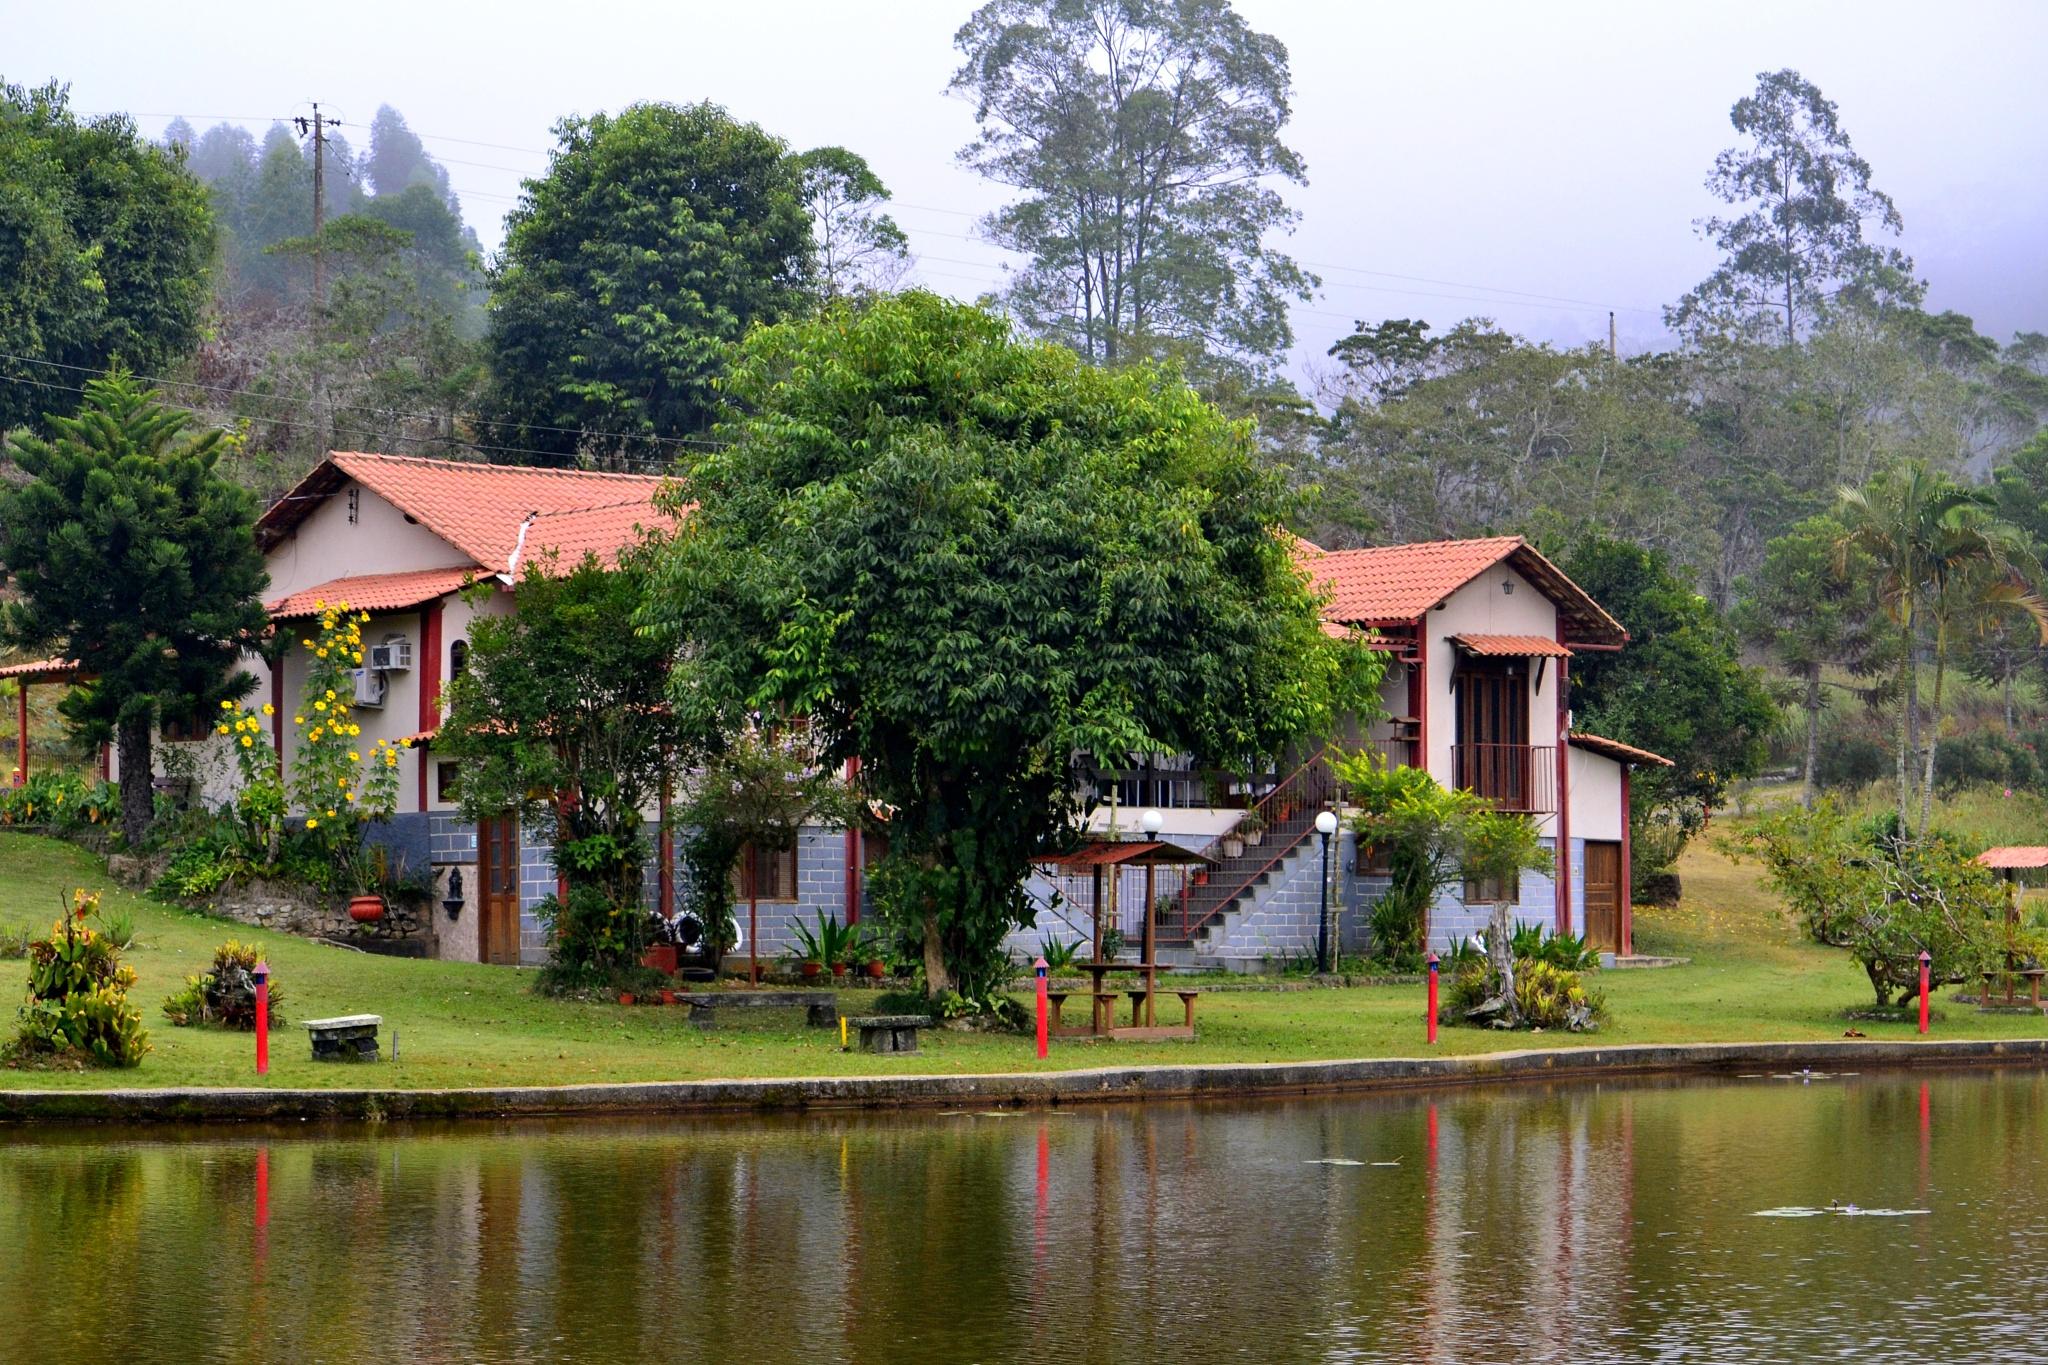 Santa Teresa-ES, Brazil by Joselito Nardy Ribeiro